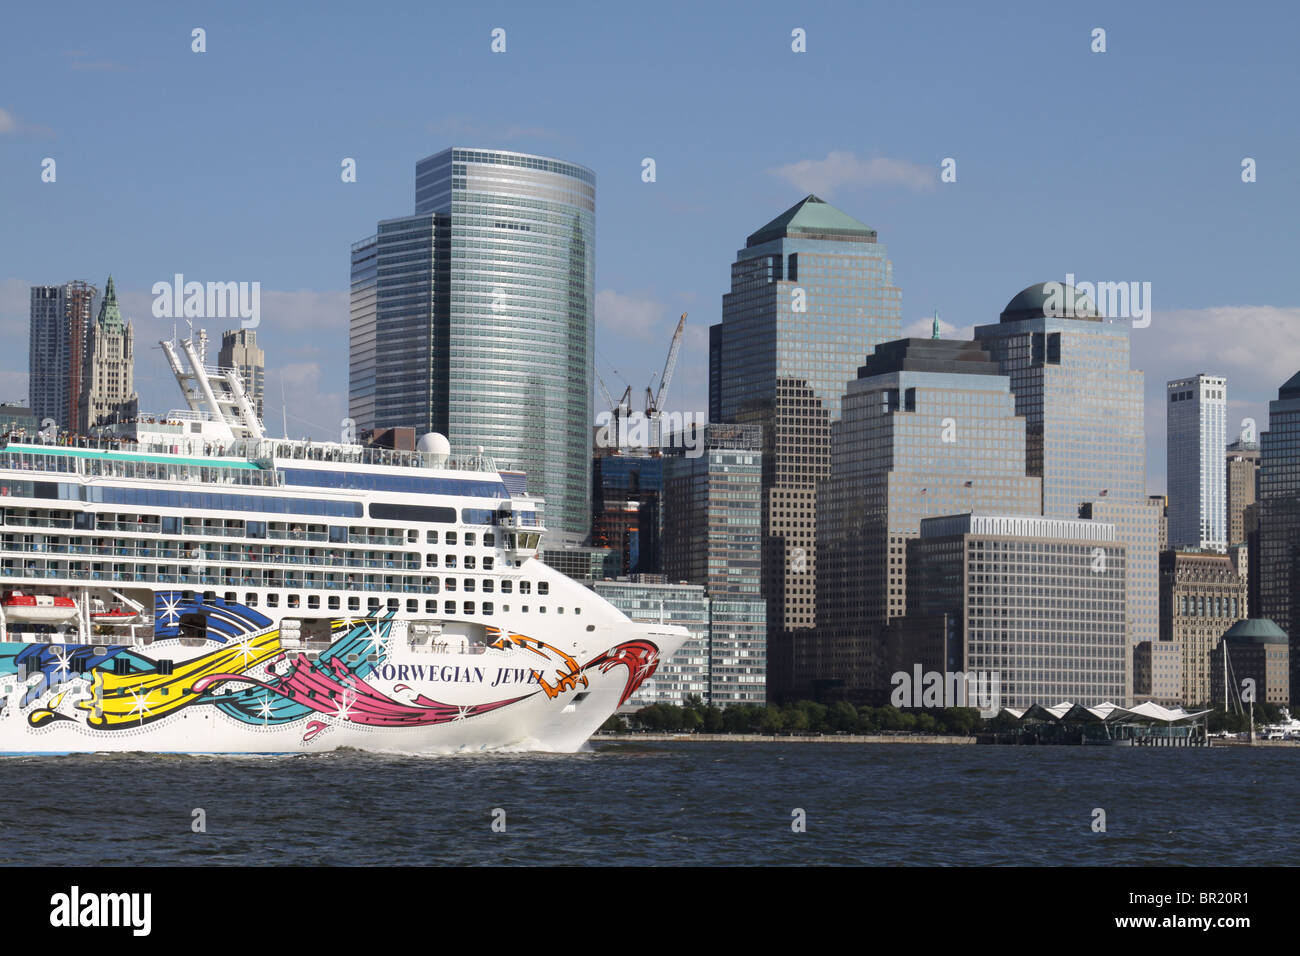 New York City- September 4, 2010-Nowegian Jewel cruise ship approching Ground Zero on the Hudson River. - Stock Image